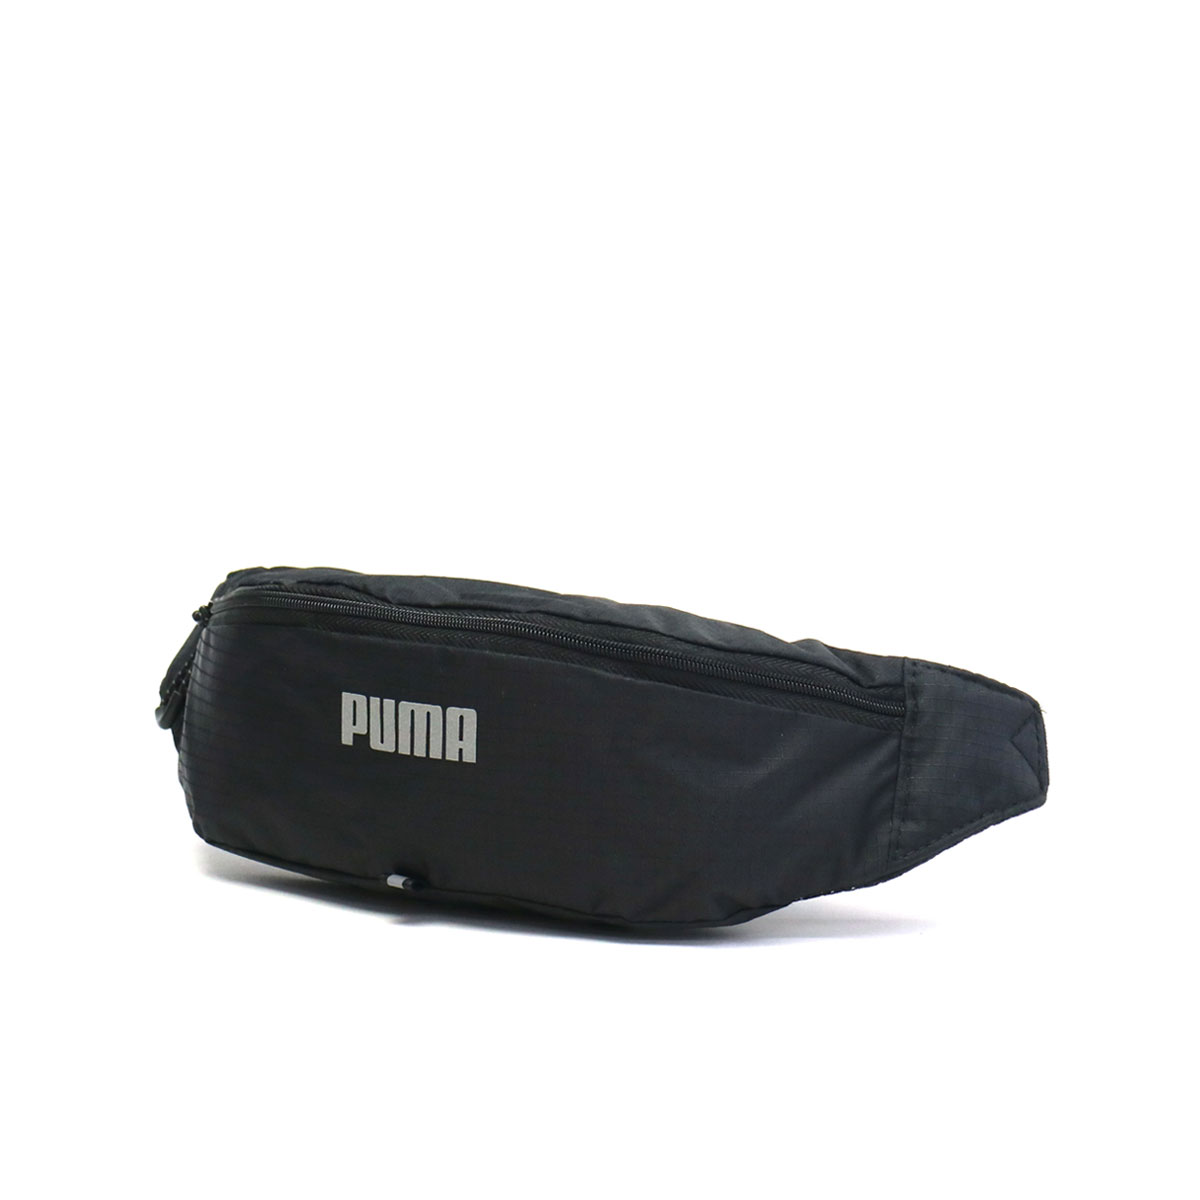 59d3037b139f05  SALE 30% OFF  PUMA Waist bag womens mens hipbag PR clasical lightweight  Run training sport festival 075471